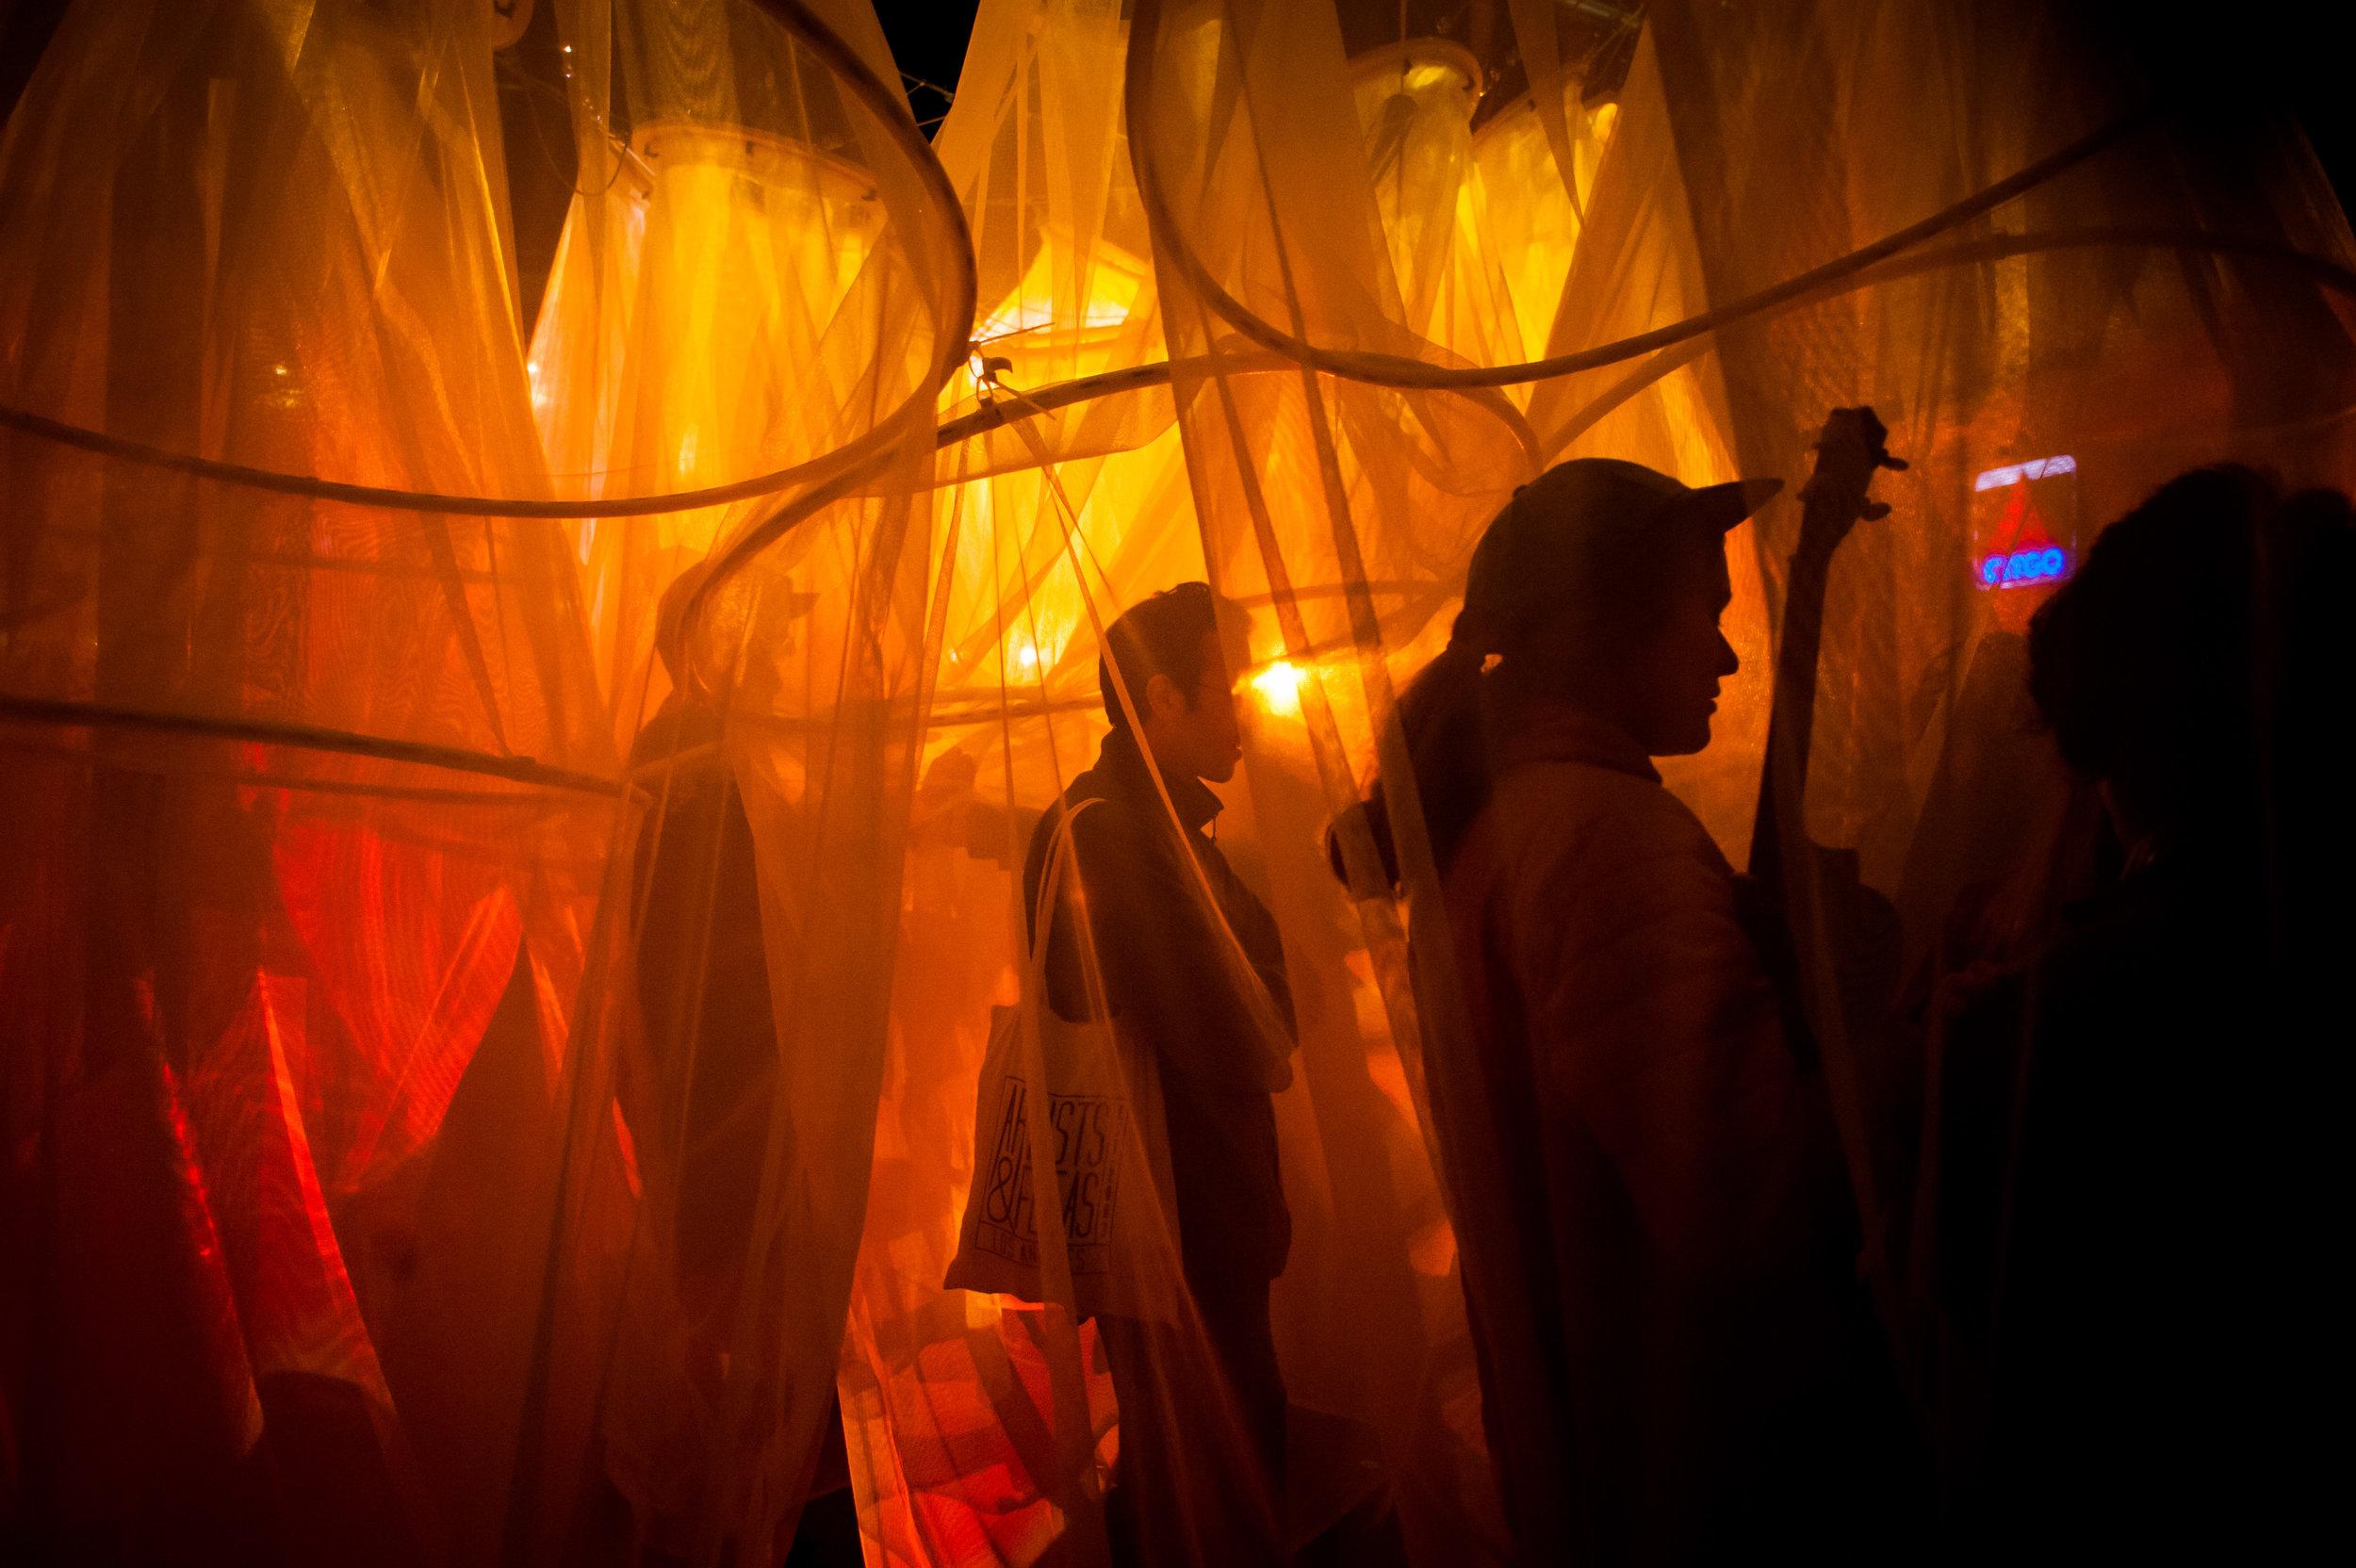 Life Source_Rob Trumbour & Jon Sakata_Illuminus 2015_Photo by Tina Tian_1.jpg